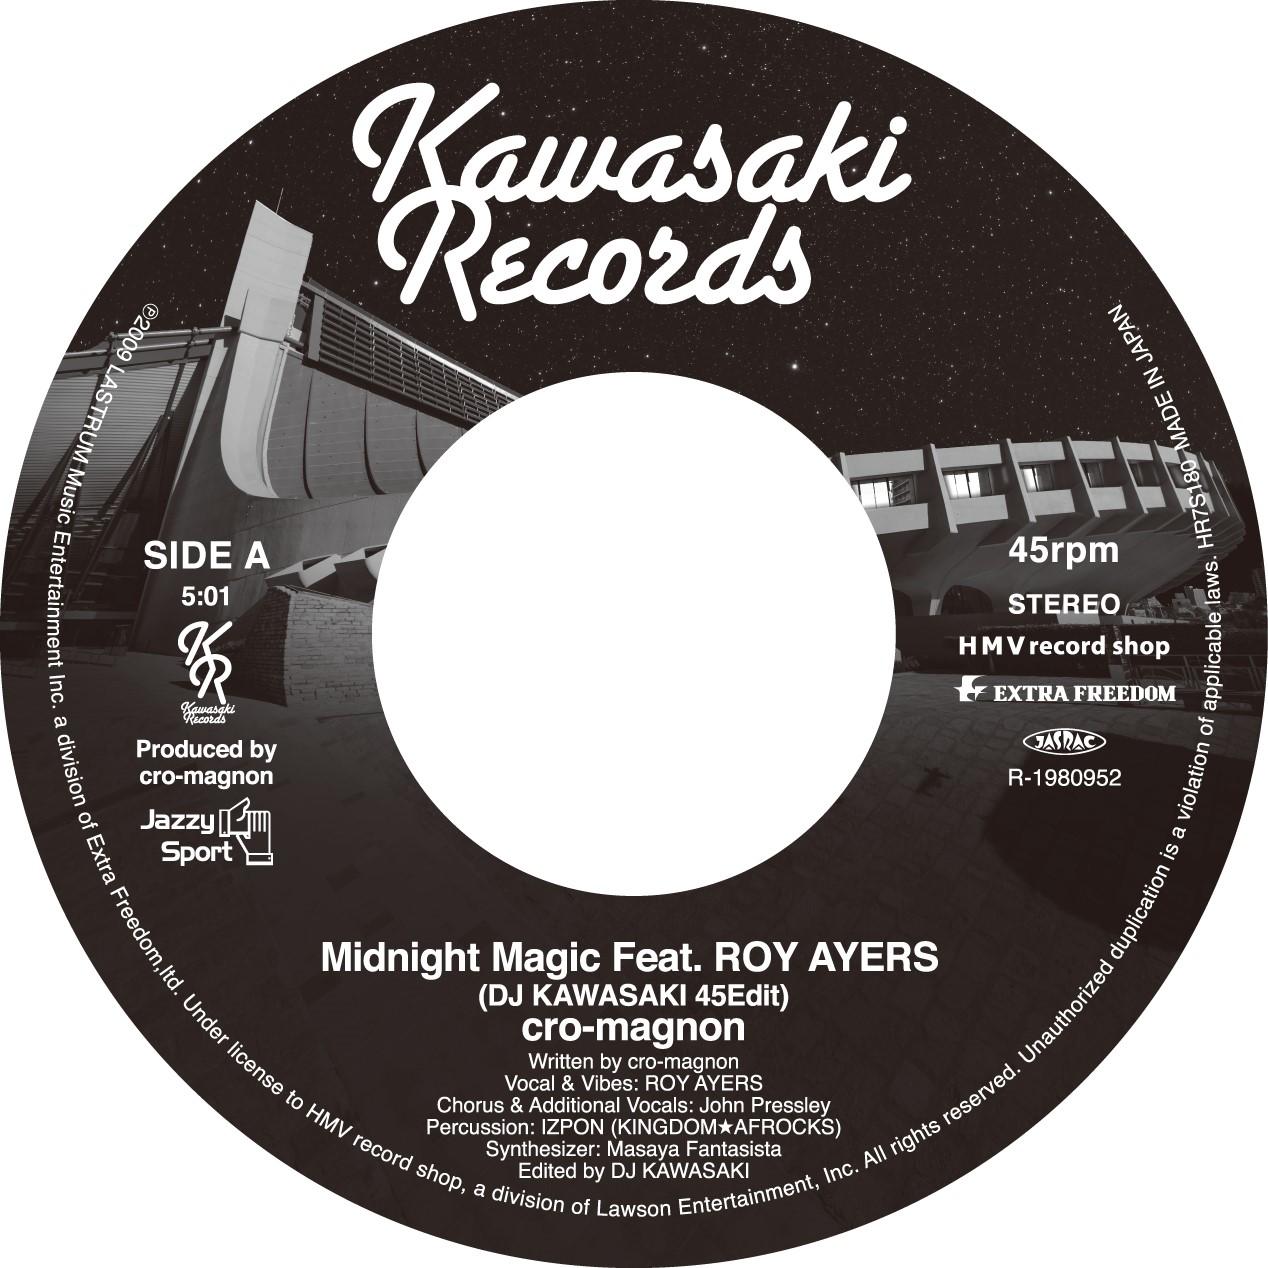 08-006 cro-magnon Midnight Magic Feat. ROY AYERS